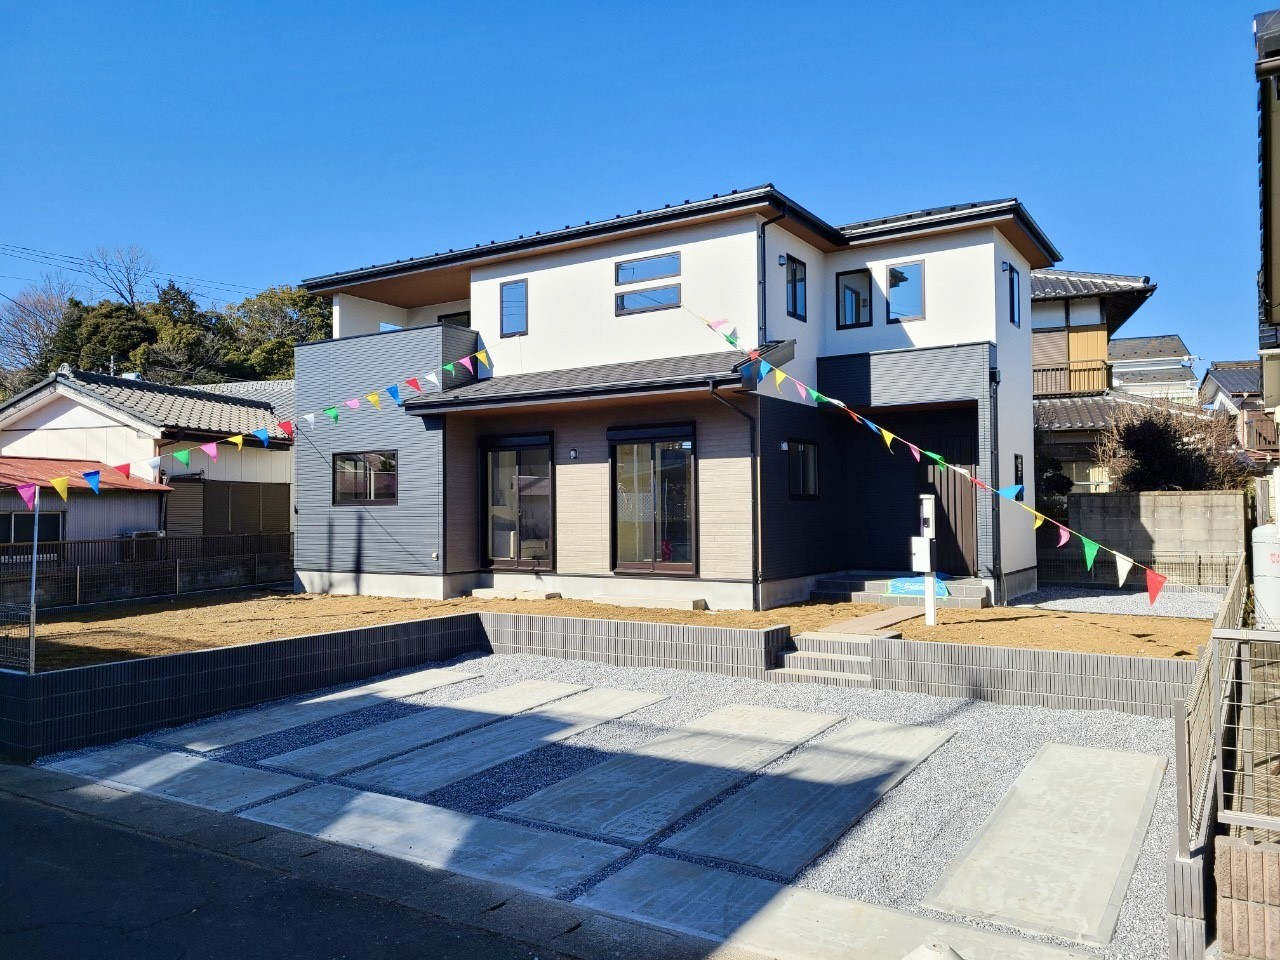 【KEIAI】 -和楽- 龍ケ崎市緑町2期 1号棟